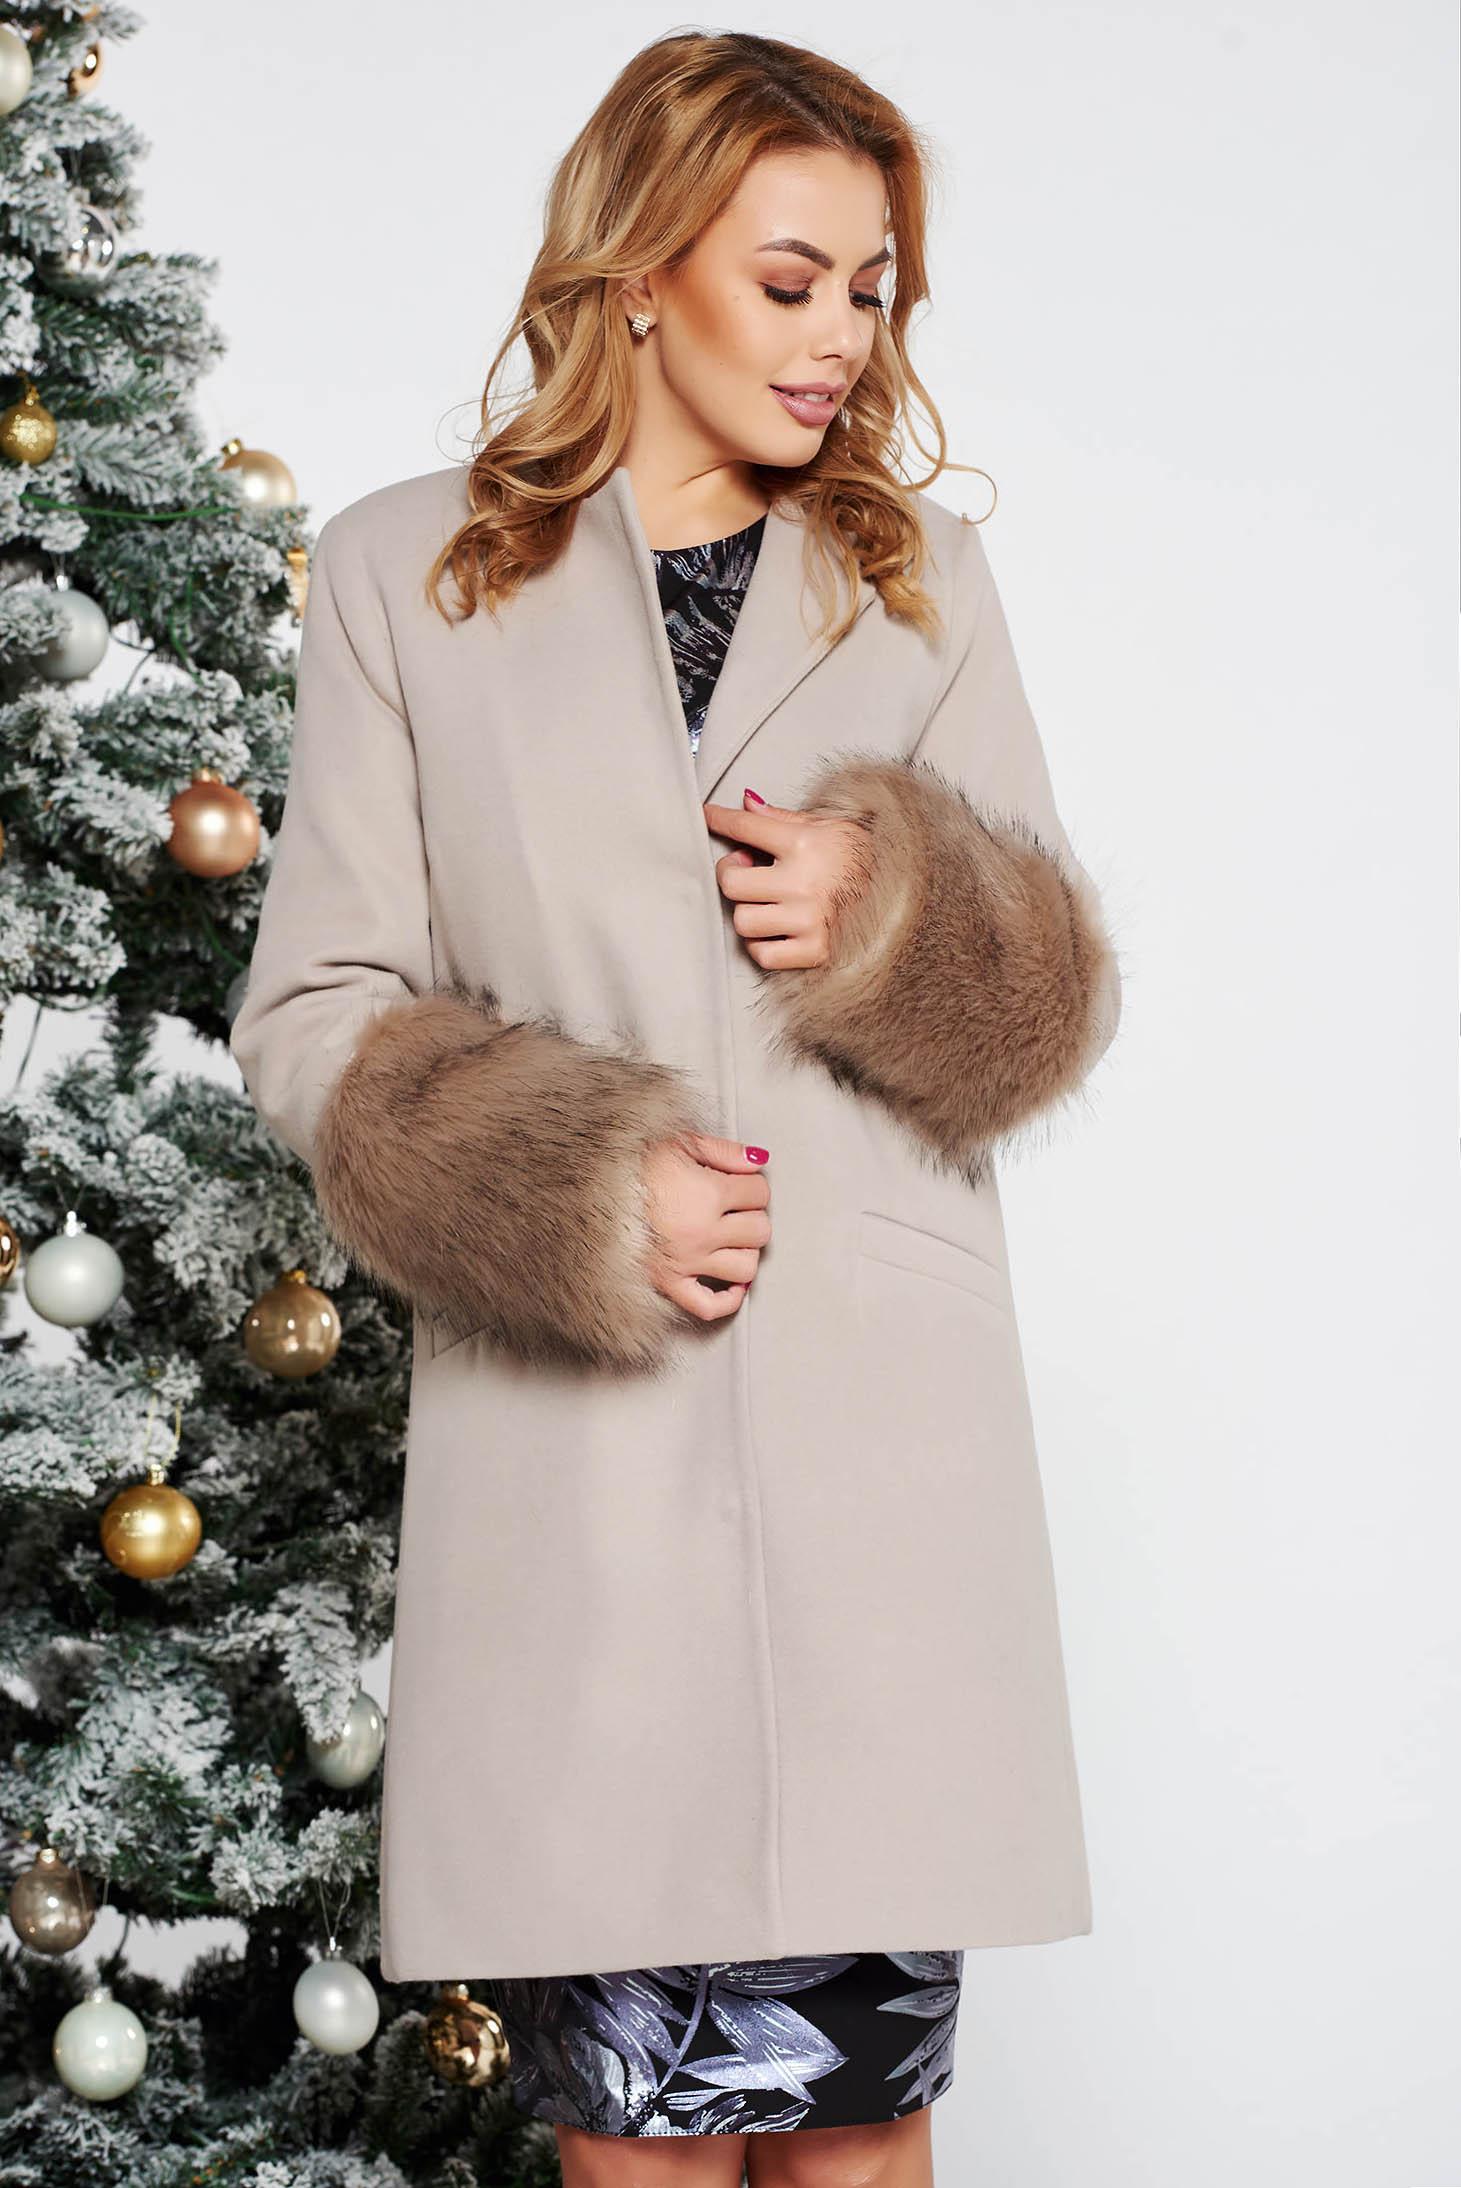 LaDonna cream elegant straight wool coat with faux fur details